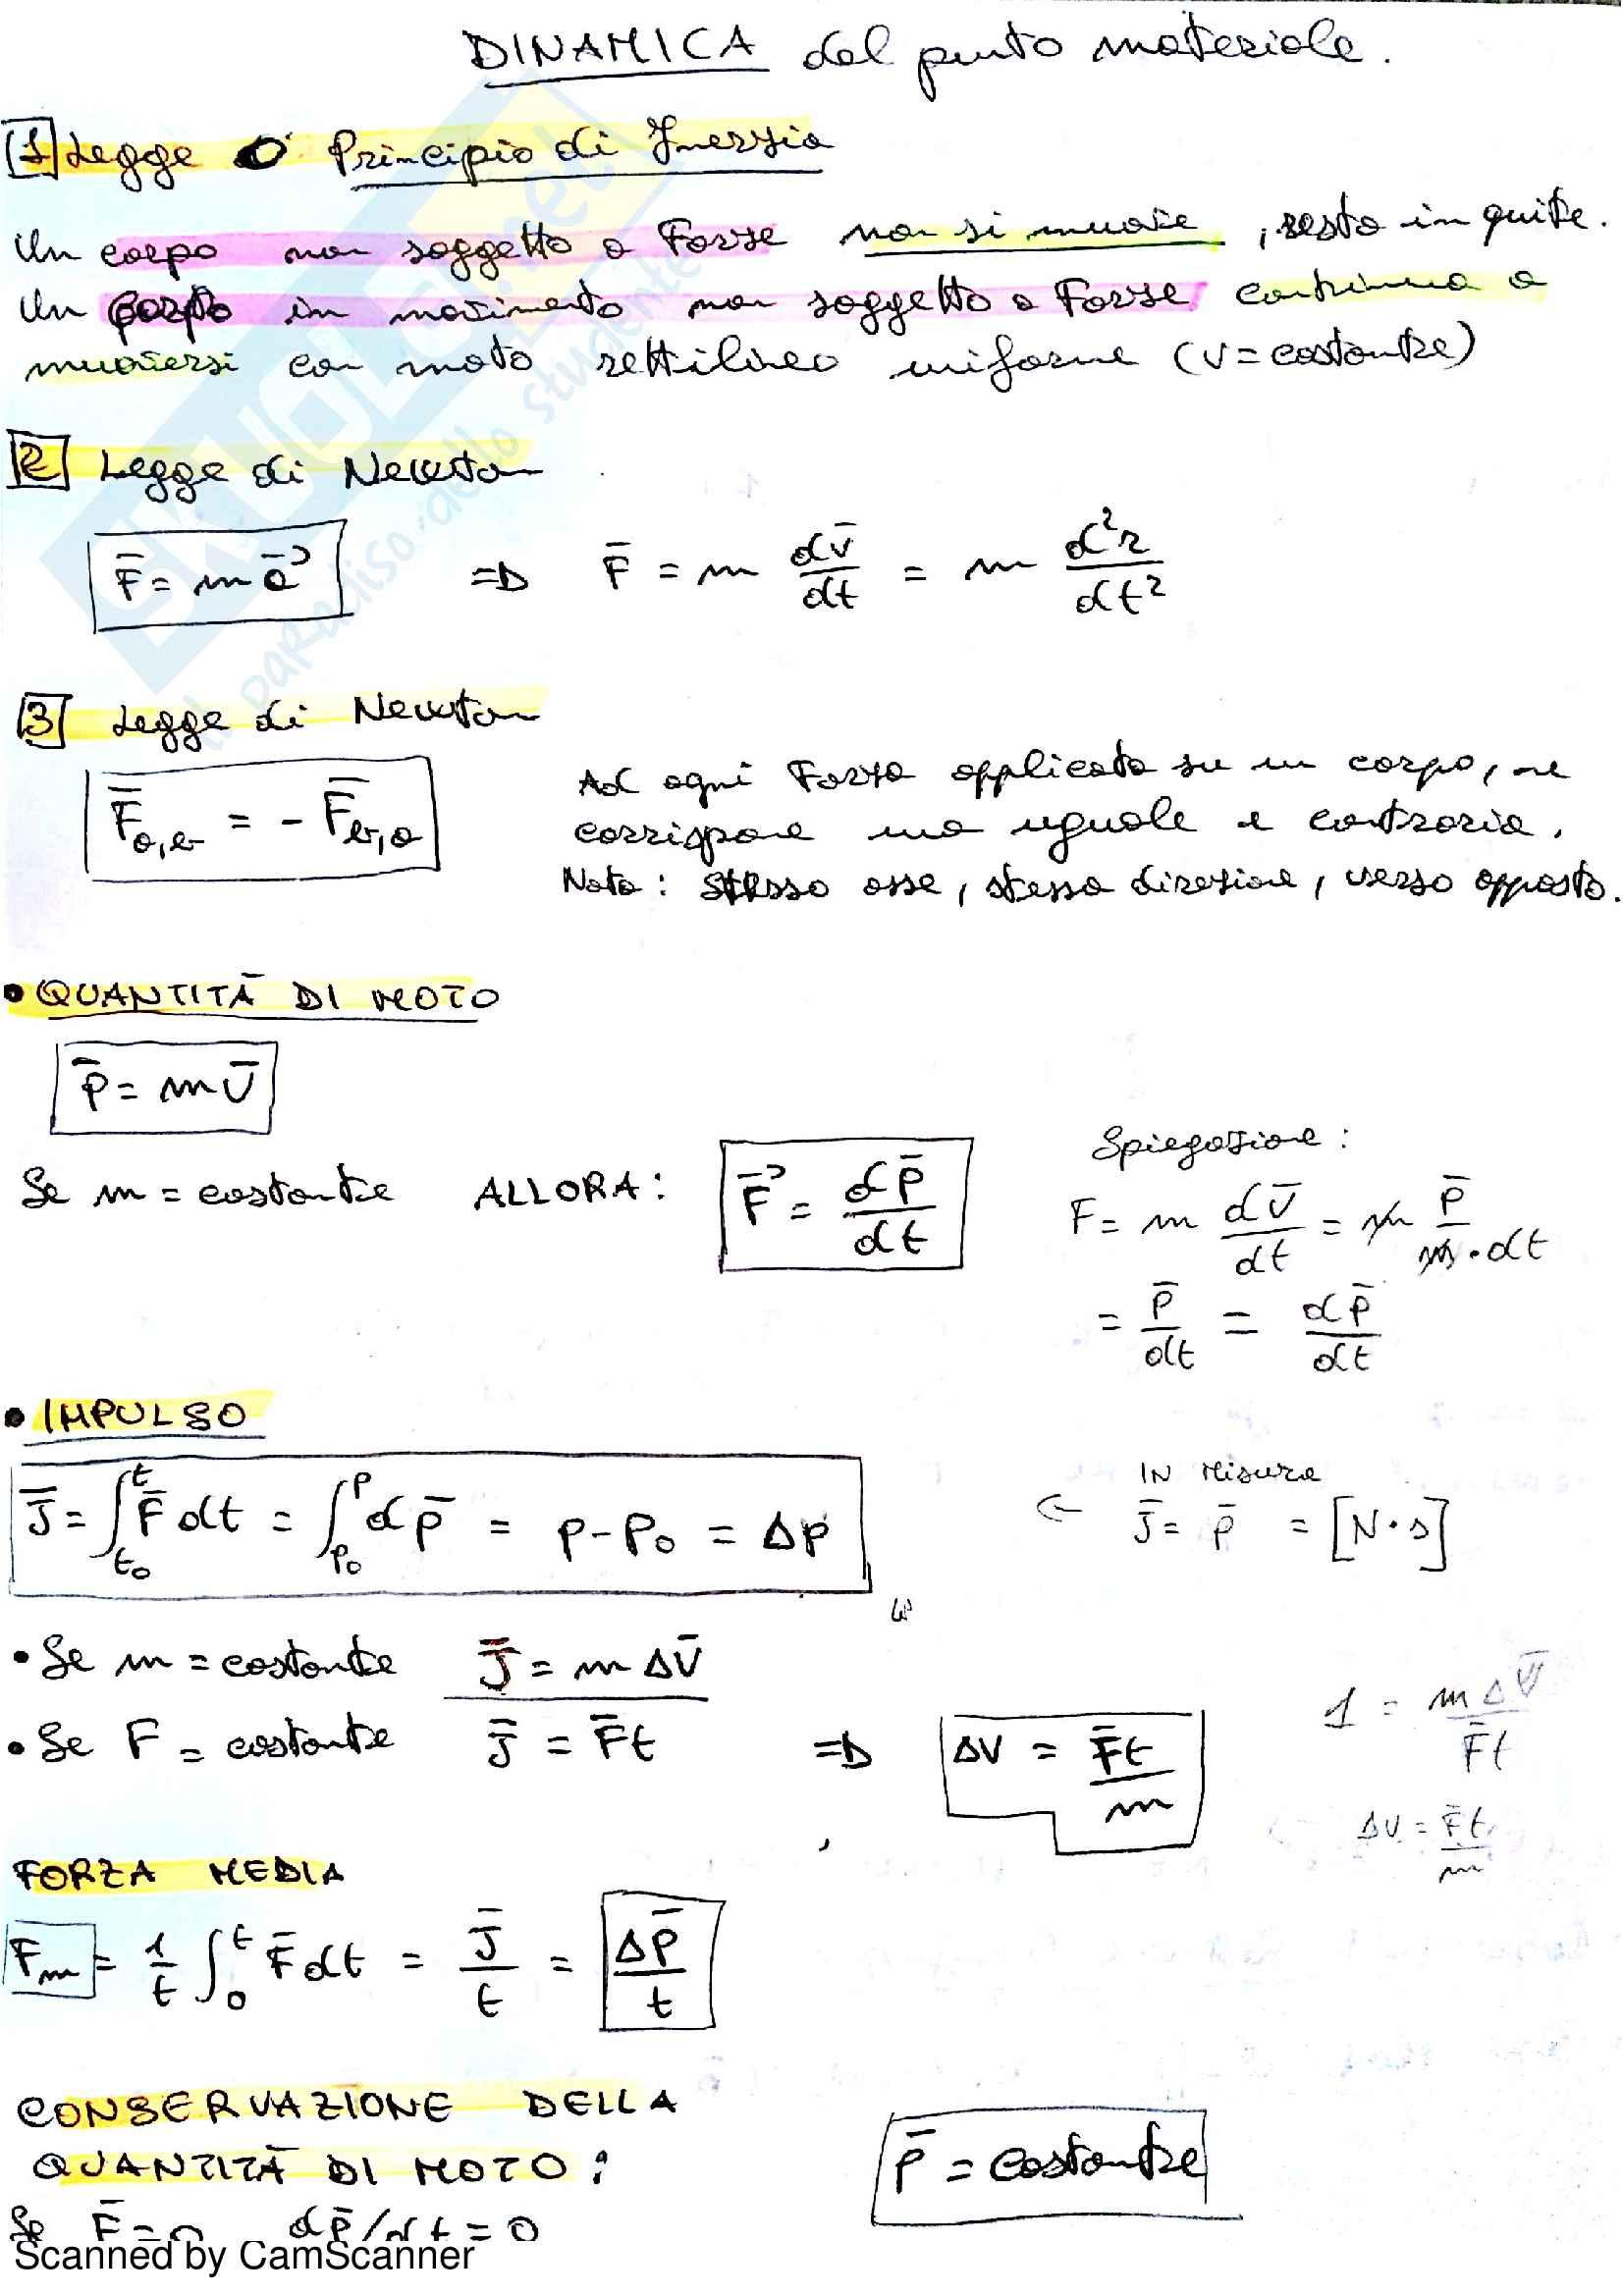 Fisica 1 , Ghigo Gianluca, Appunti + QUIZ Esame + Temi Esame (Polito) Pag. 21